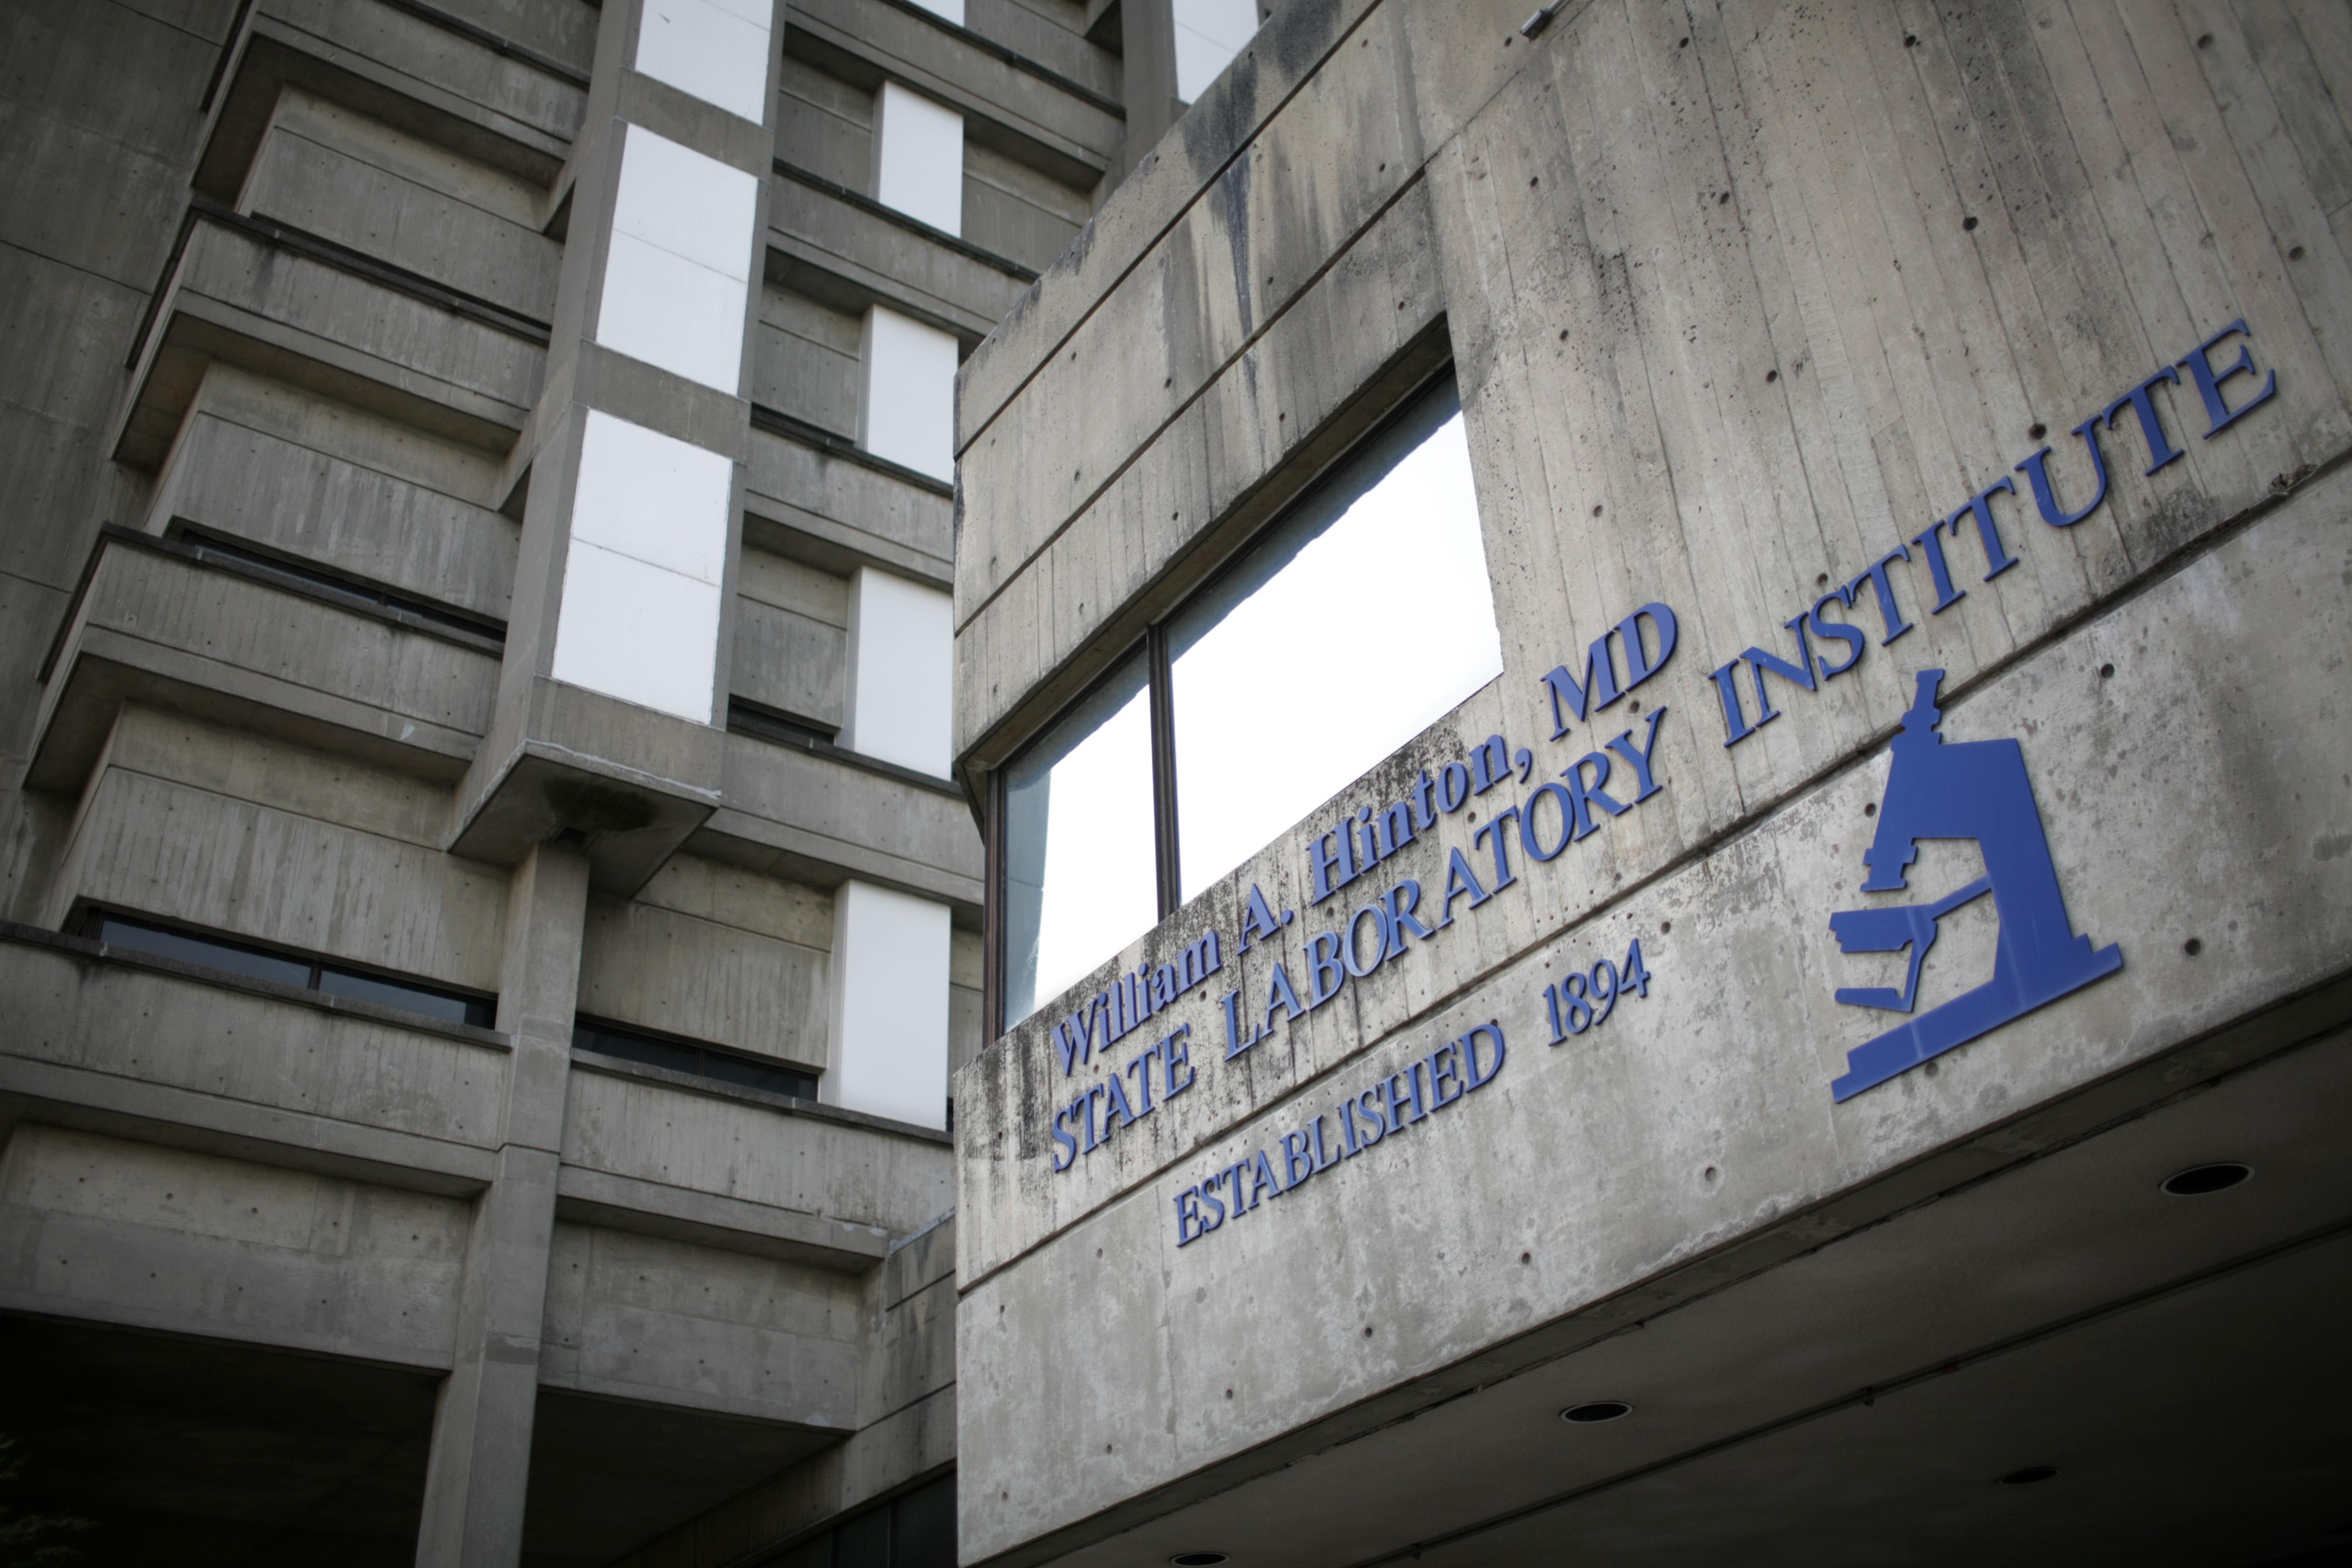 Hinton State Laboratory Institute